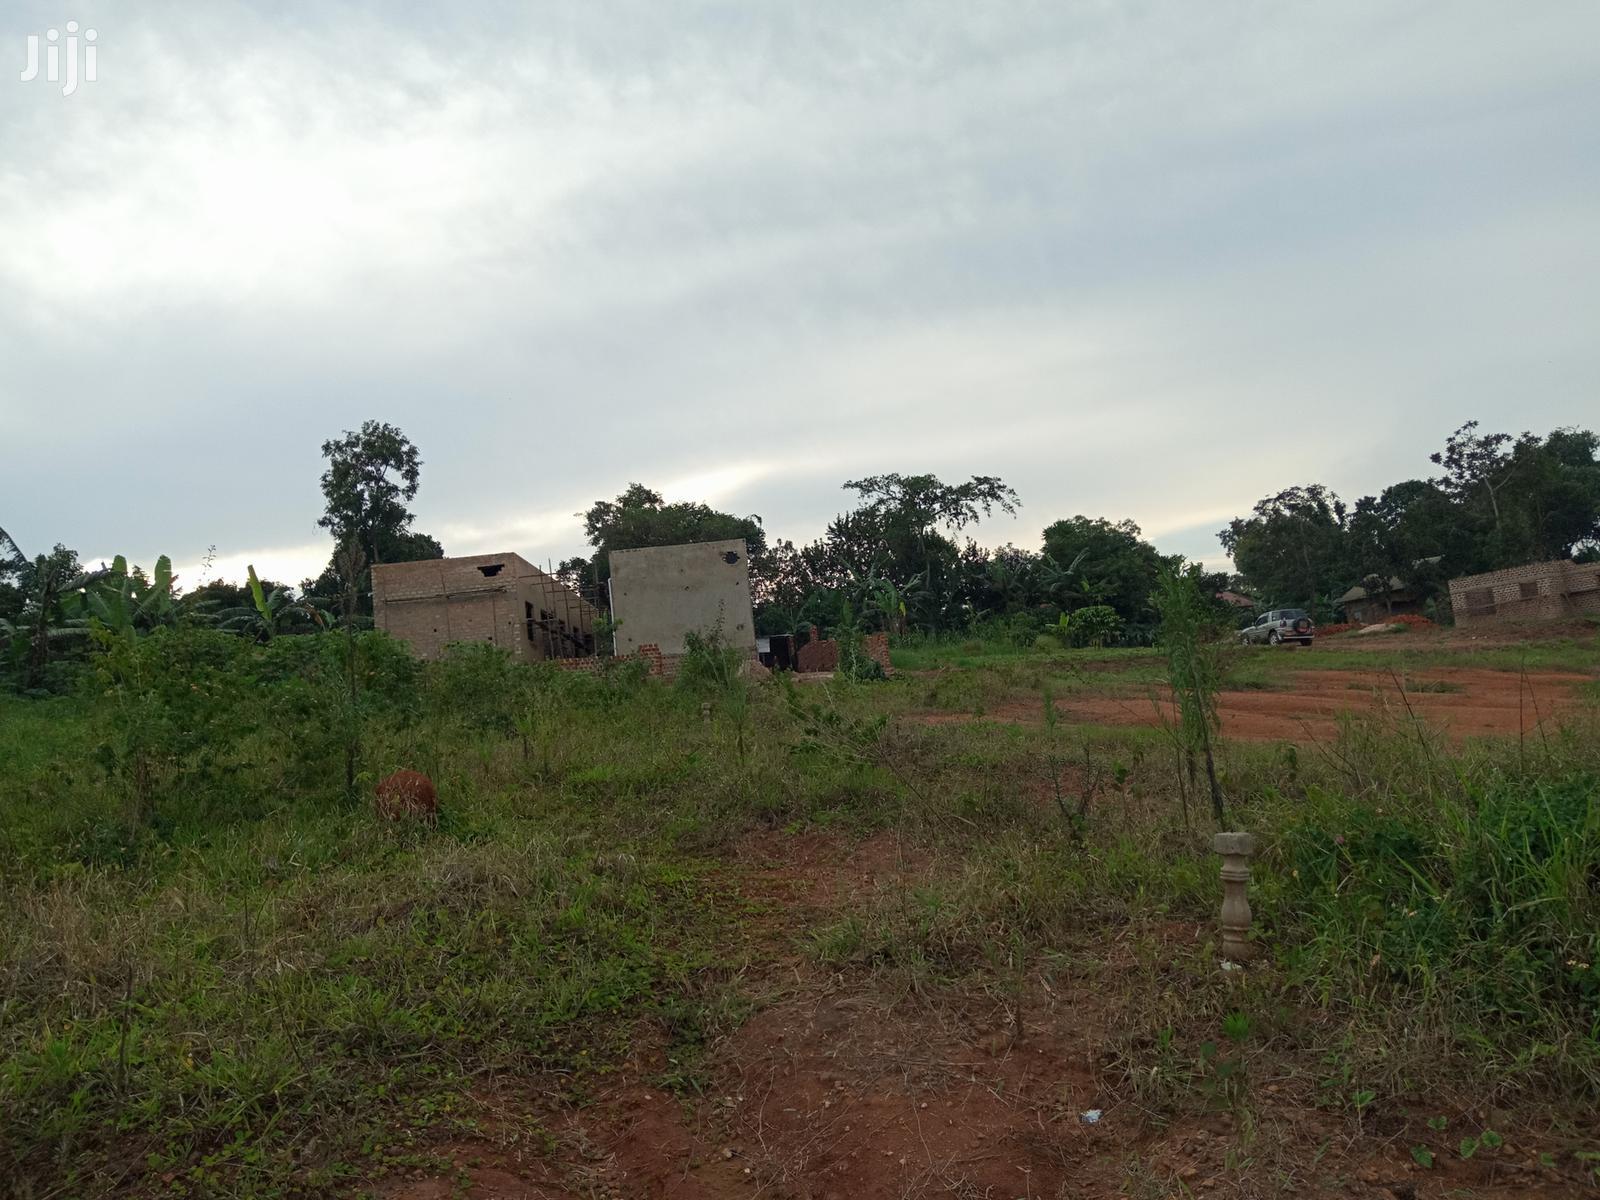 Kira Nice Plot of Land for Sell | Land & Plots For Sale for sale in Kampala, Central Region, Uganda